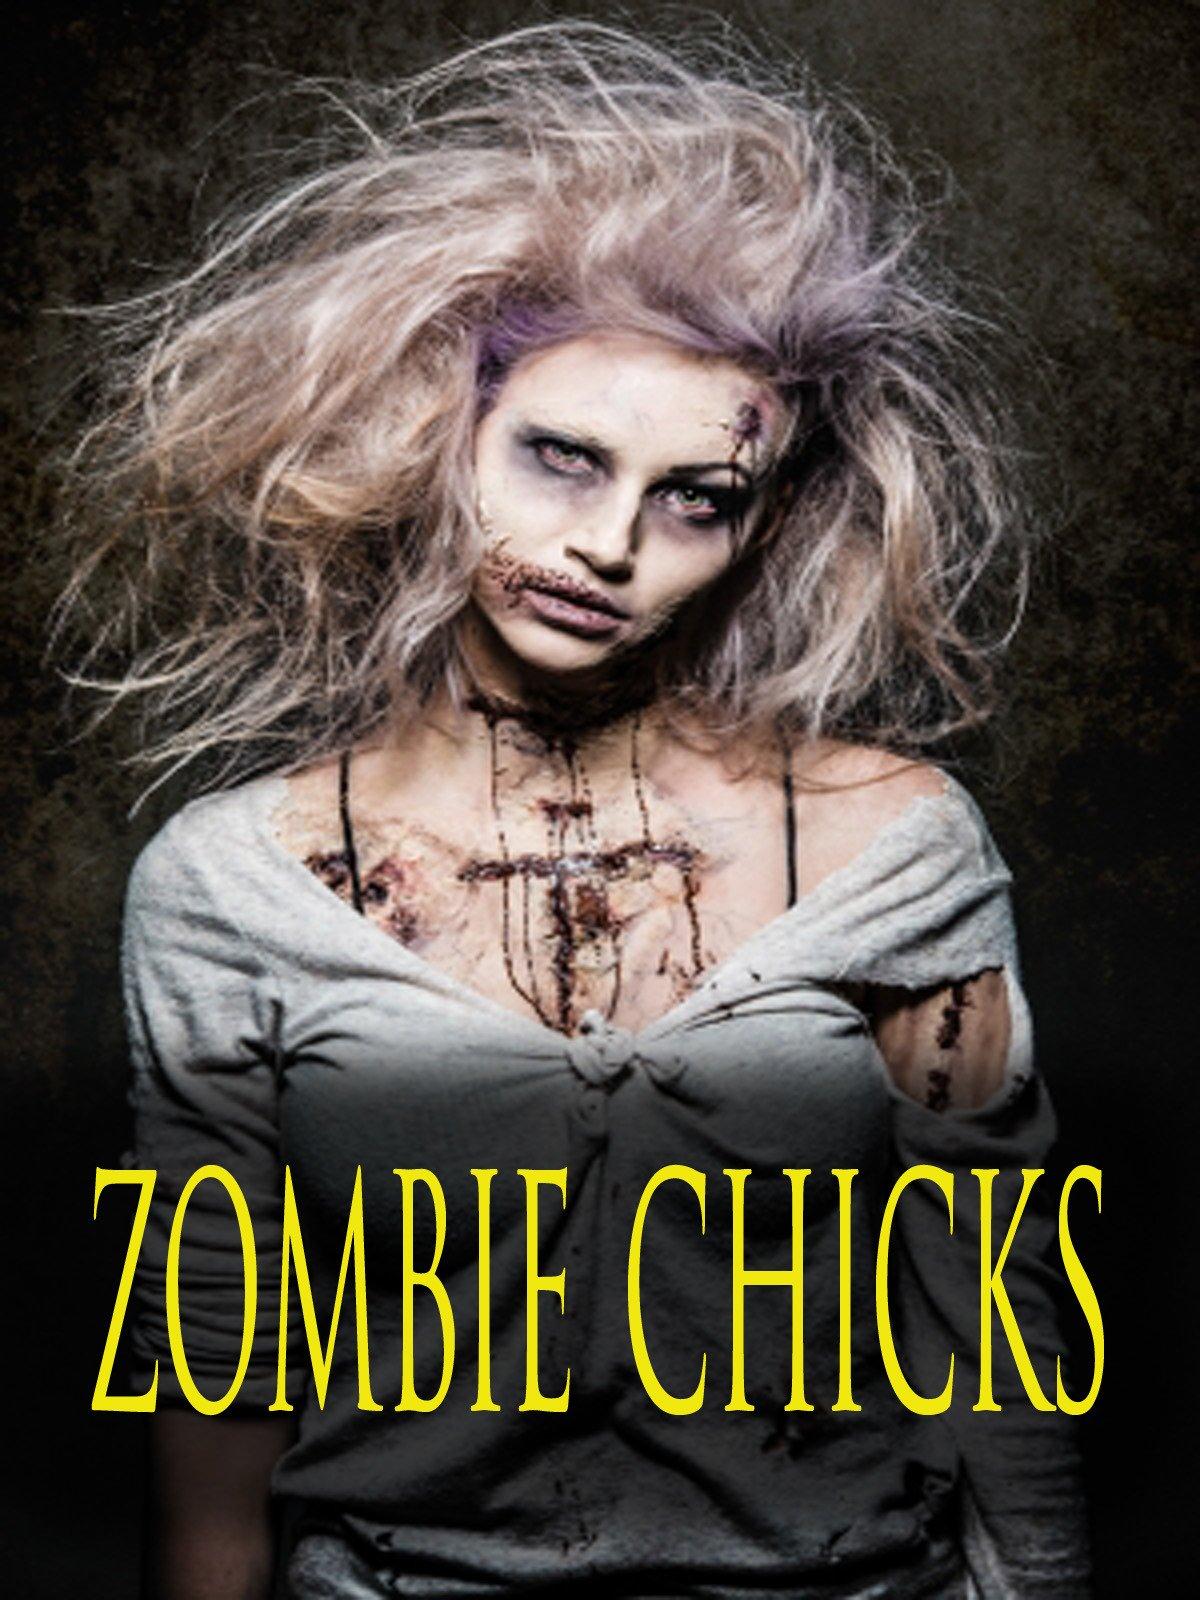 Zombie Chicks